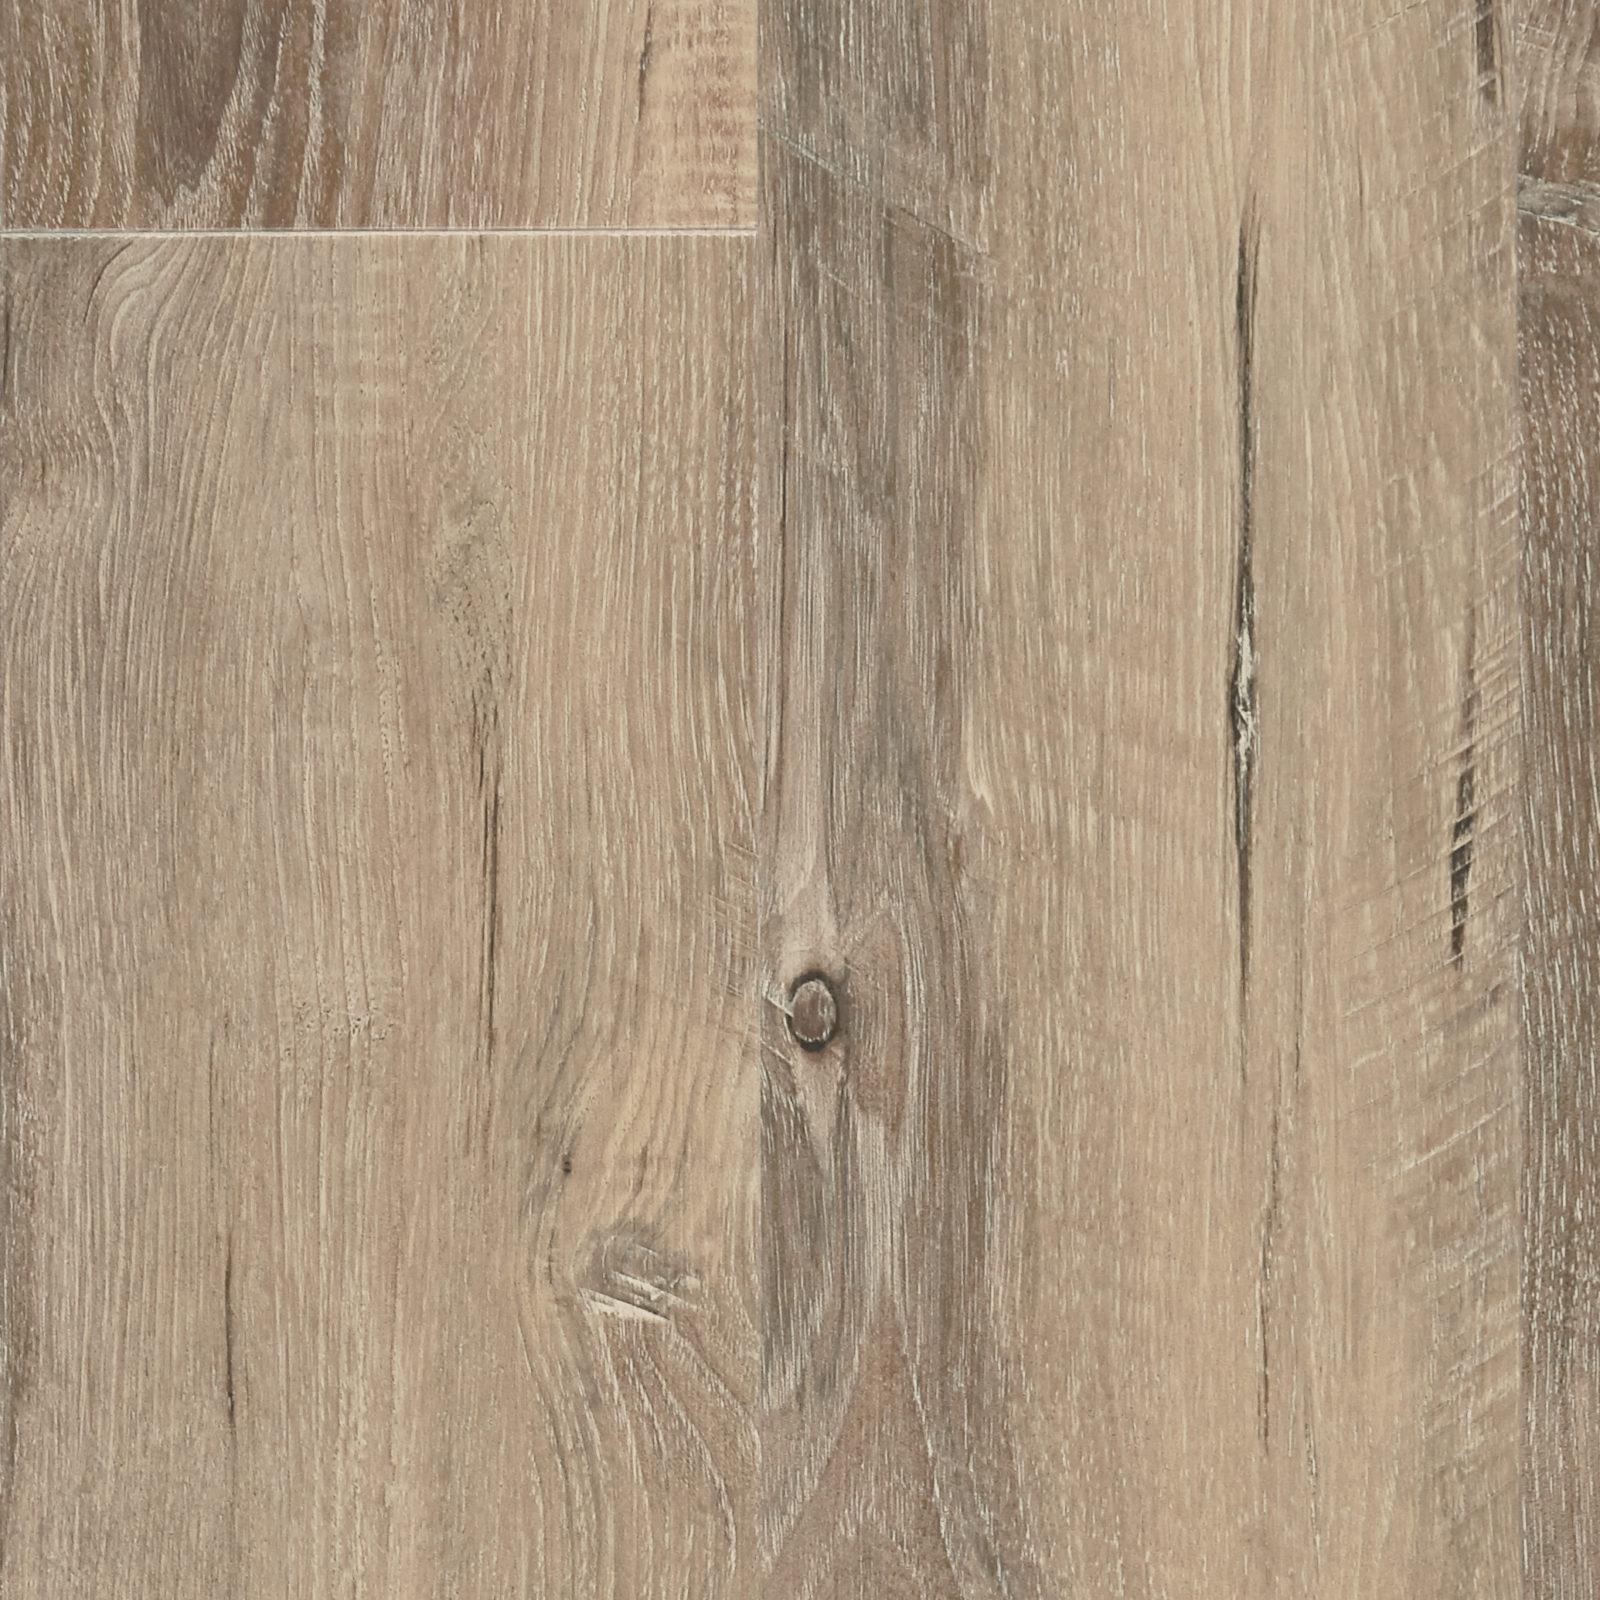 Adura max luxury vinyl plank dry cork max060 6 x 48 for Cork vs vinyl flooring